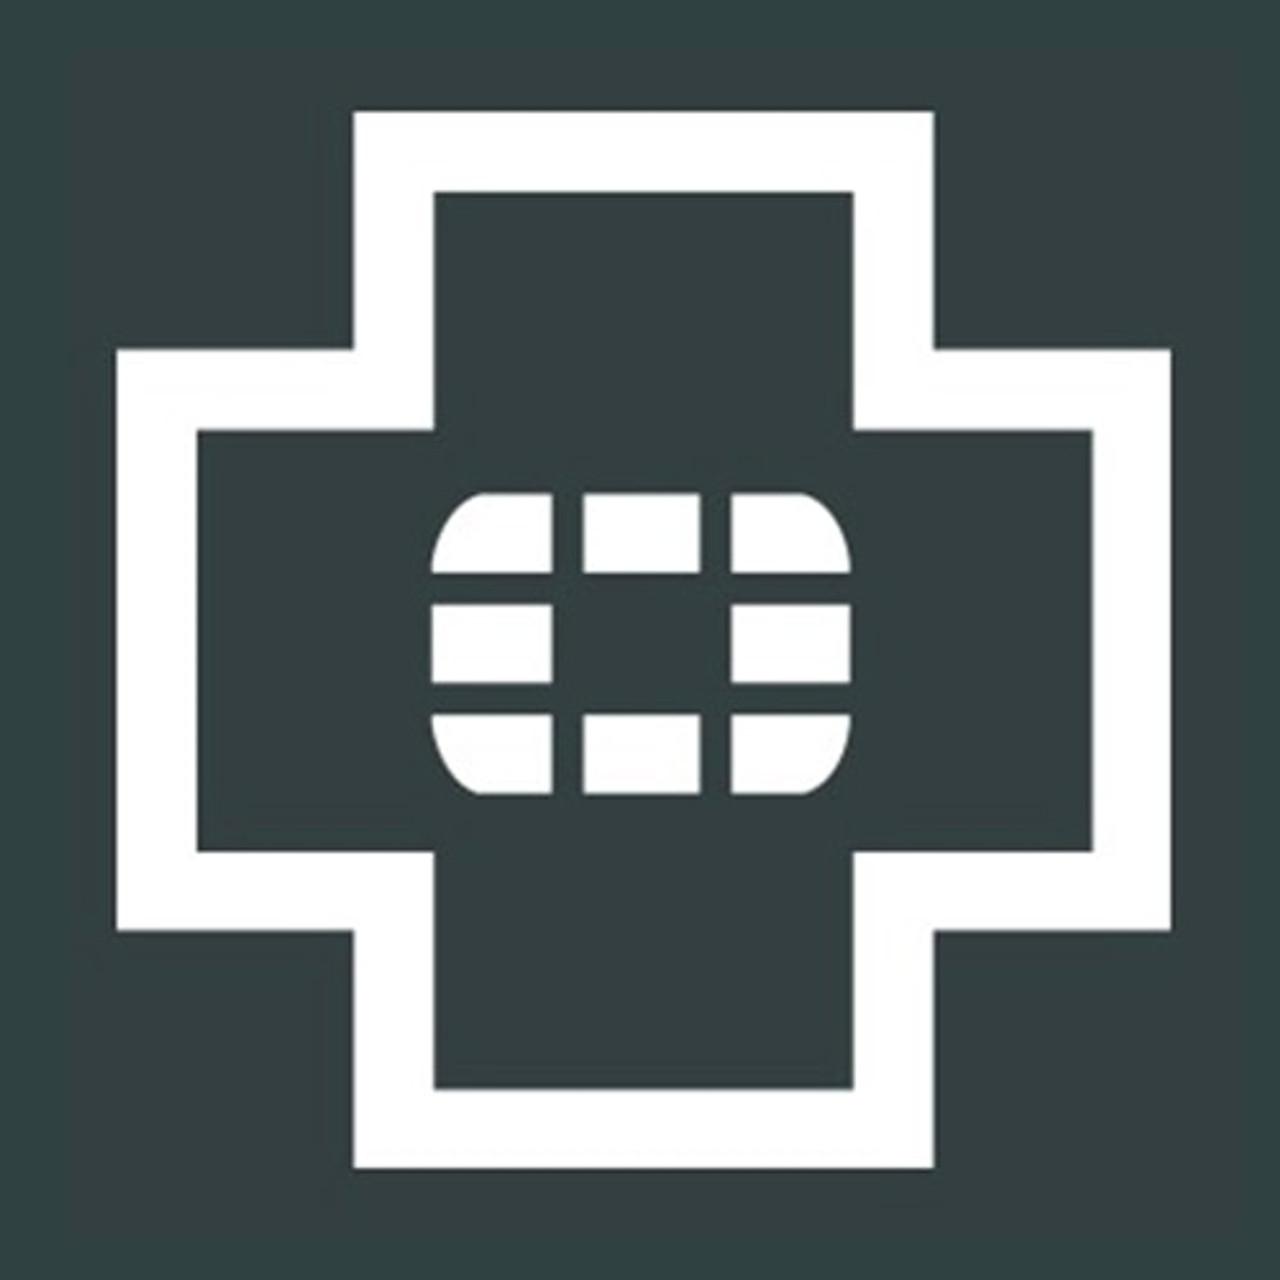 FortiGate-301E - 8x5 FortiCare Contract - 36 months